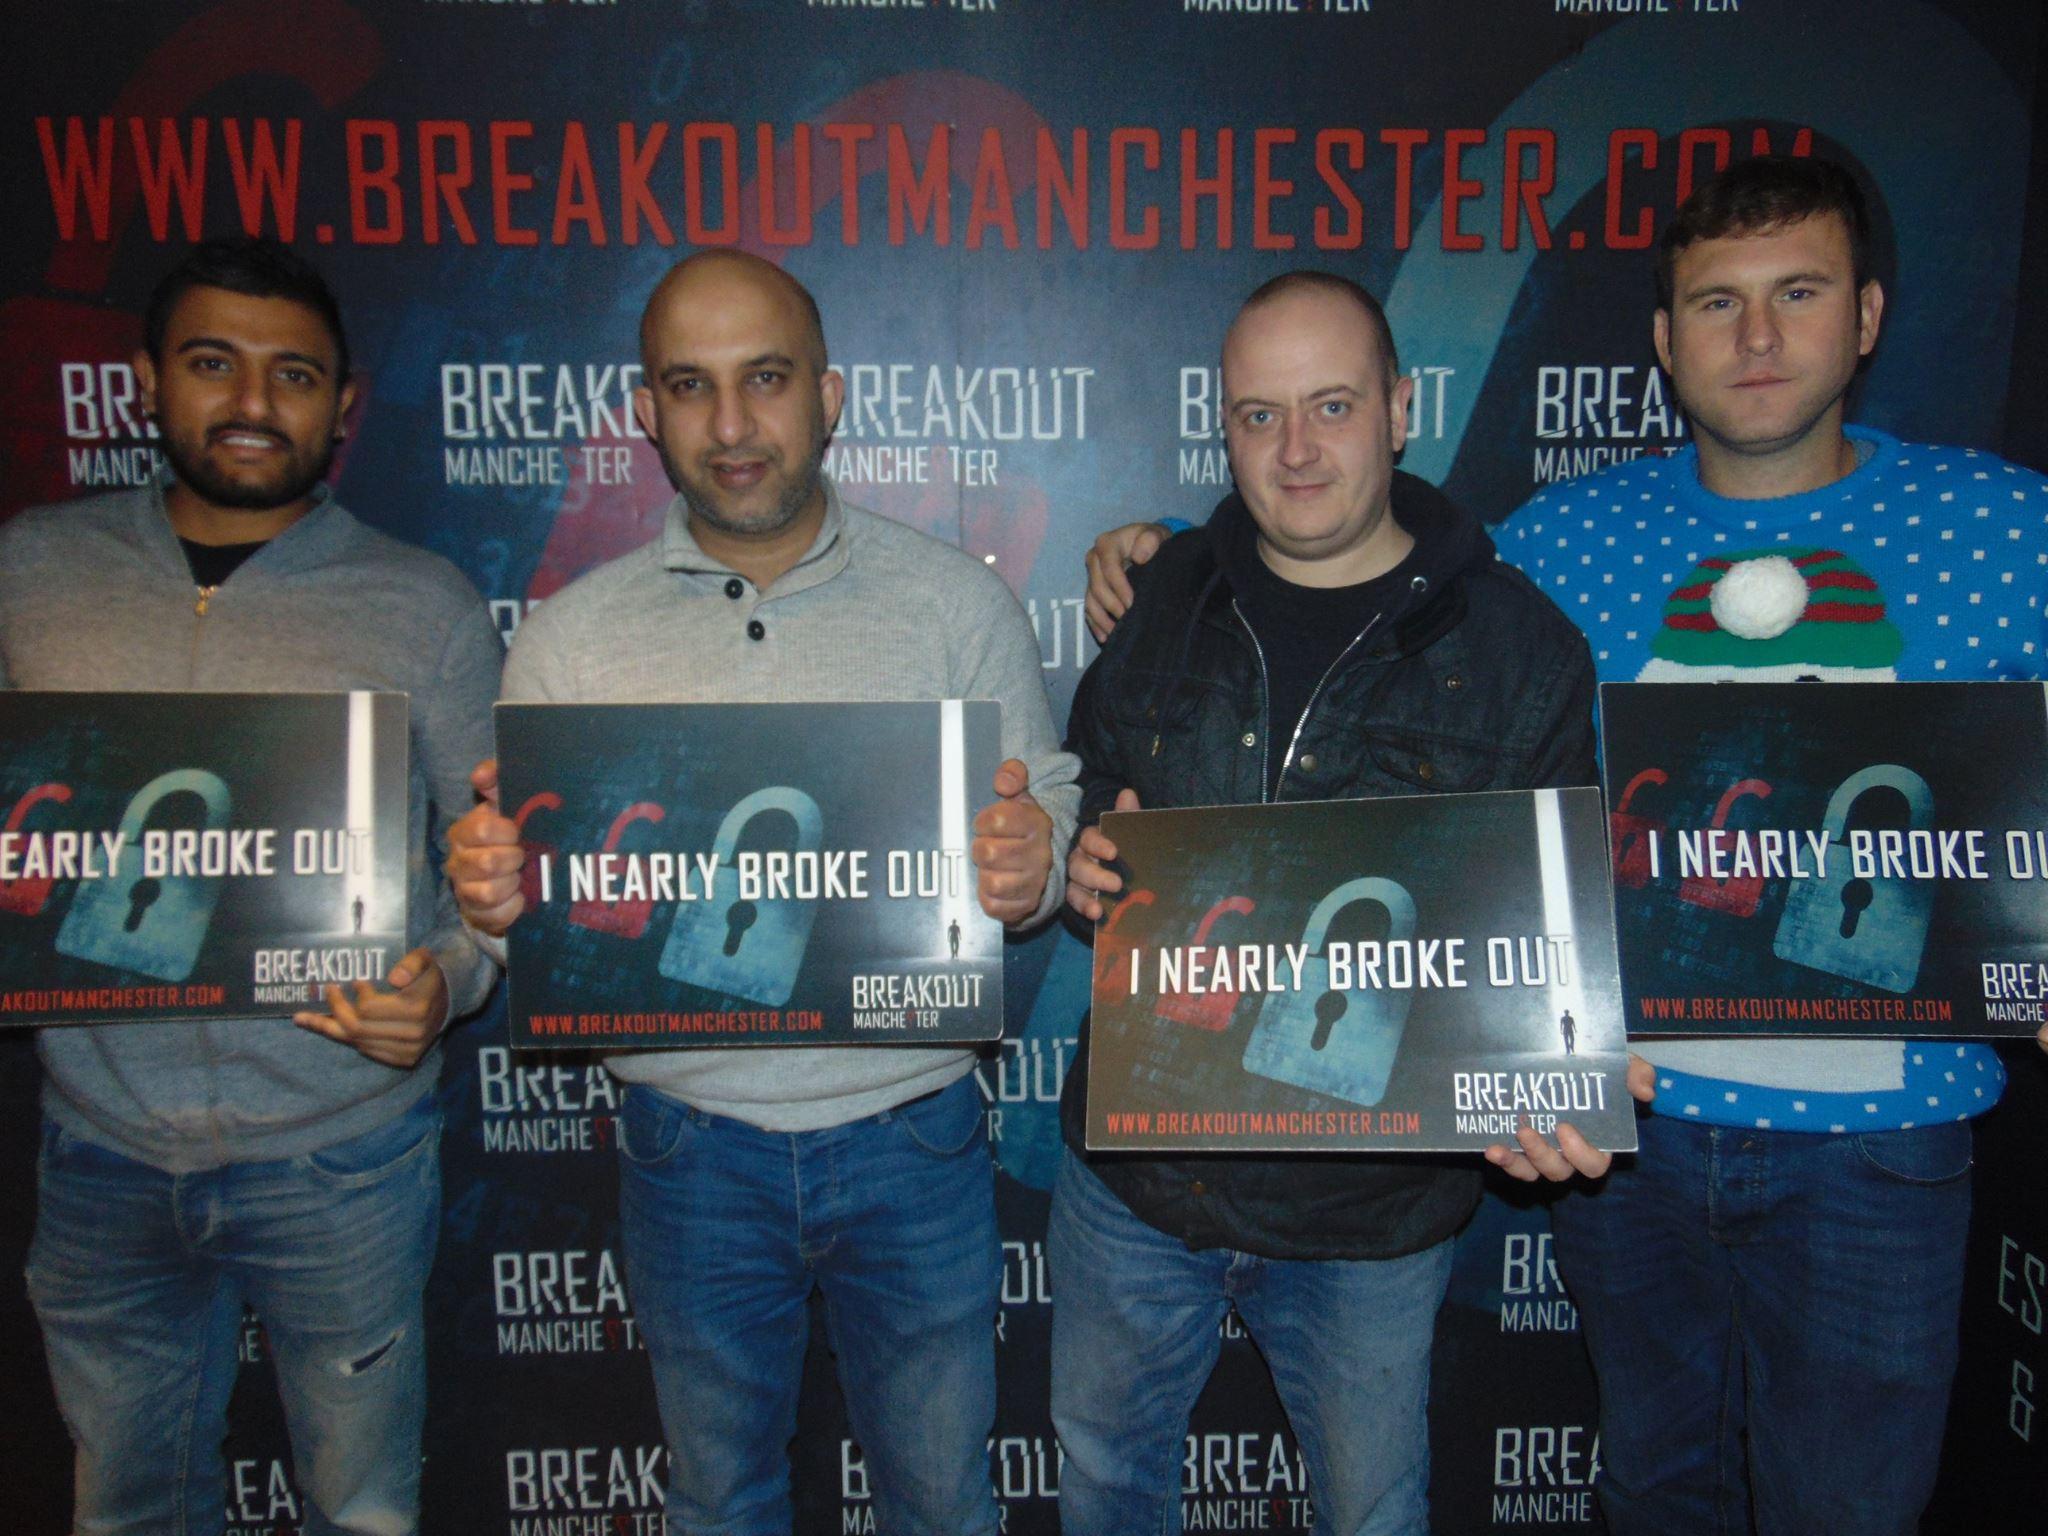 Joe_Ant_Rash_Suraj Team Breakout.jpg